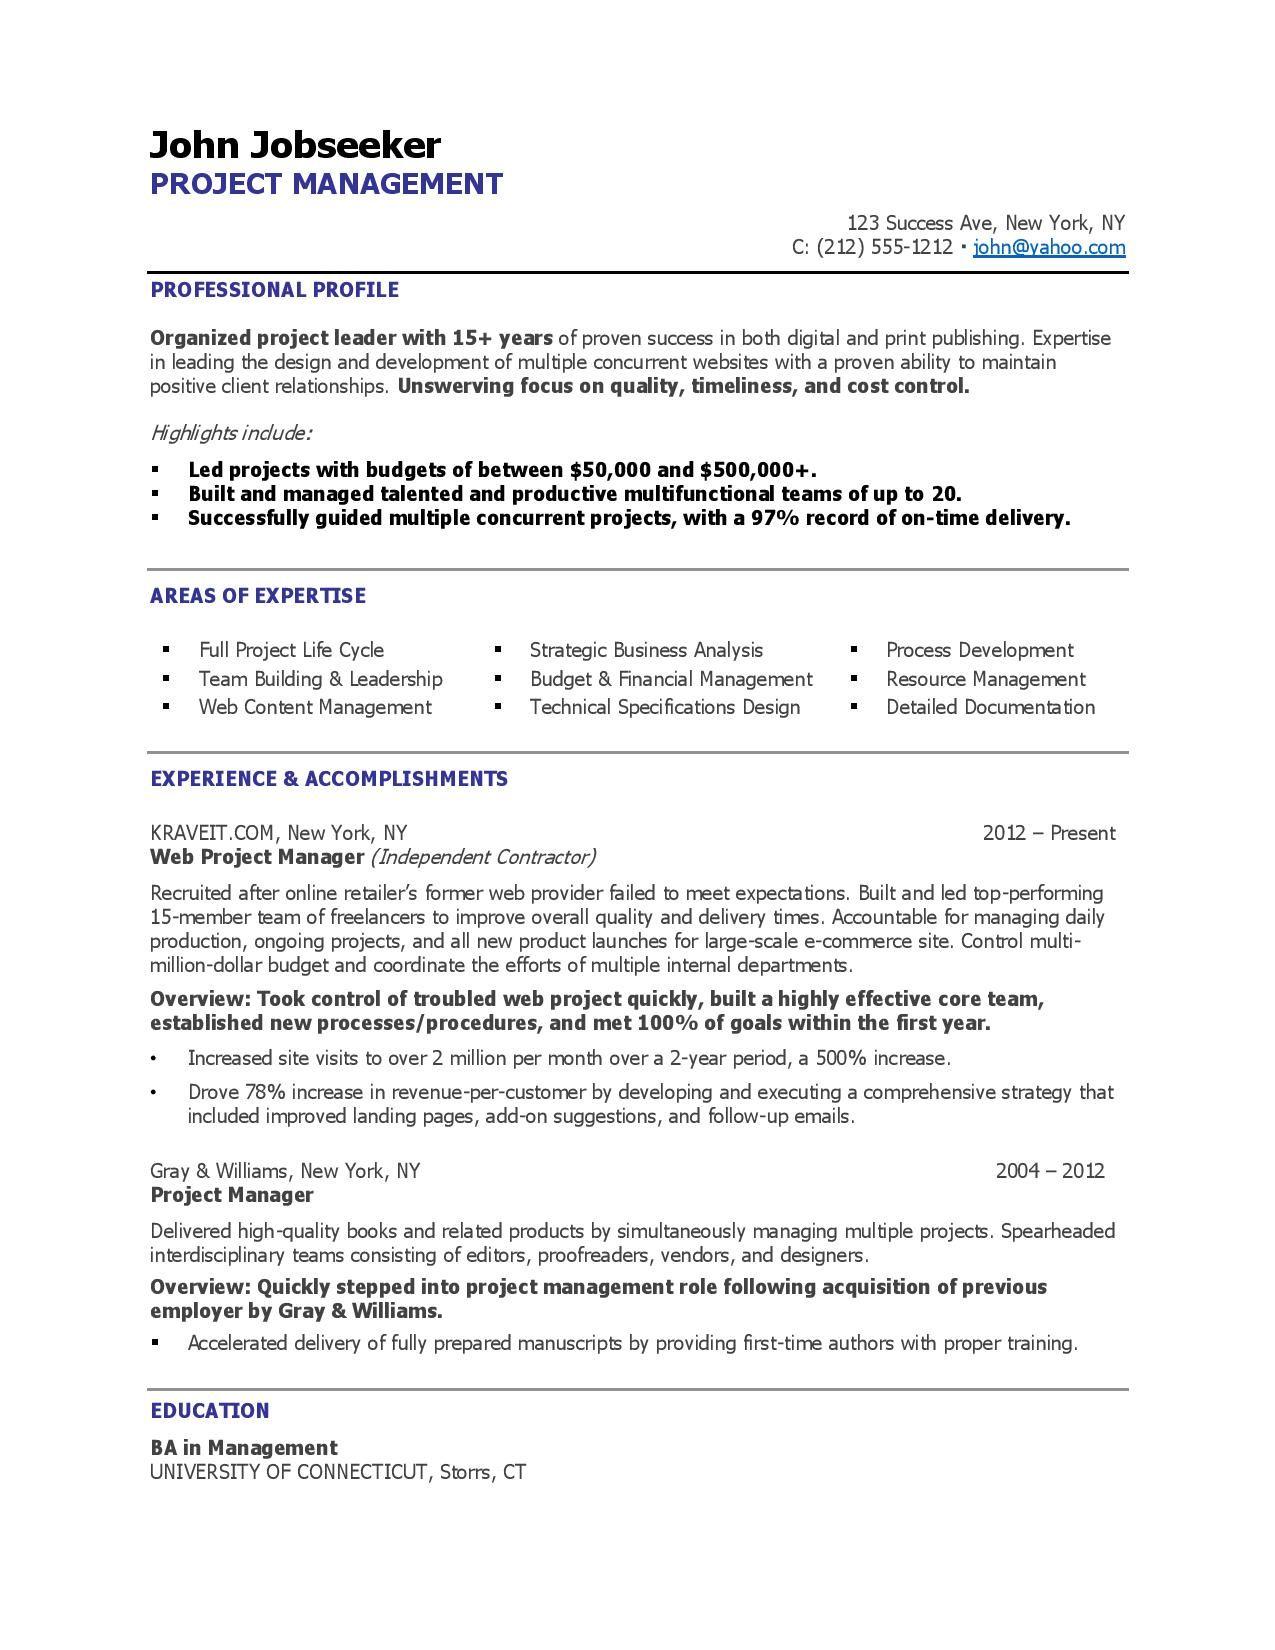 Great Resume Examples Resume Downloads Resume skills